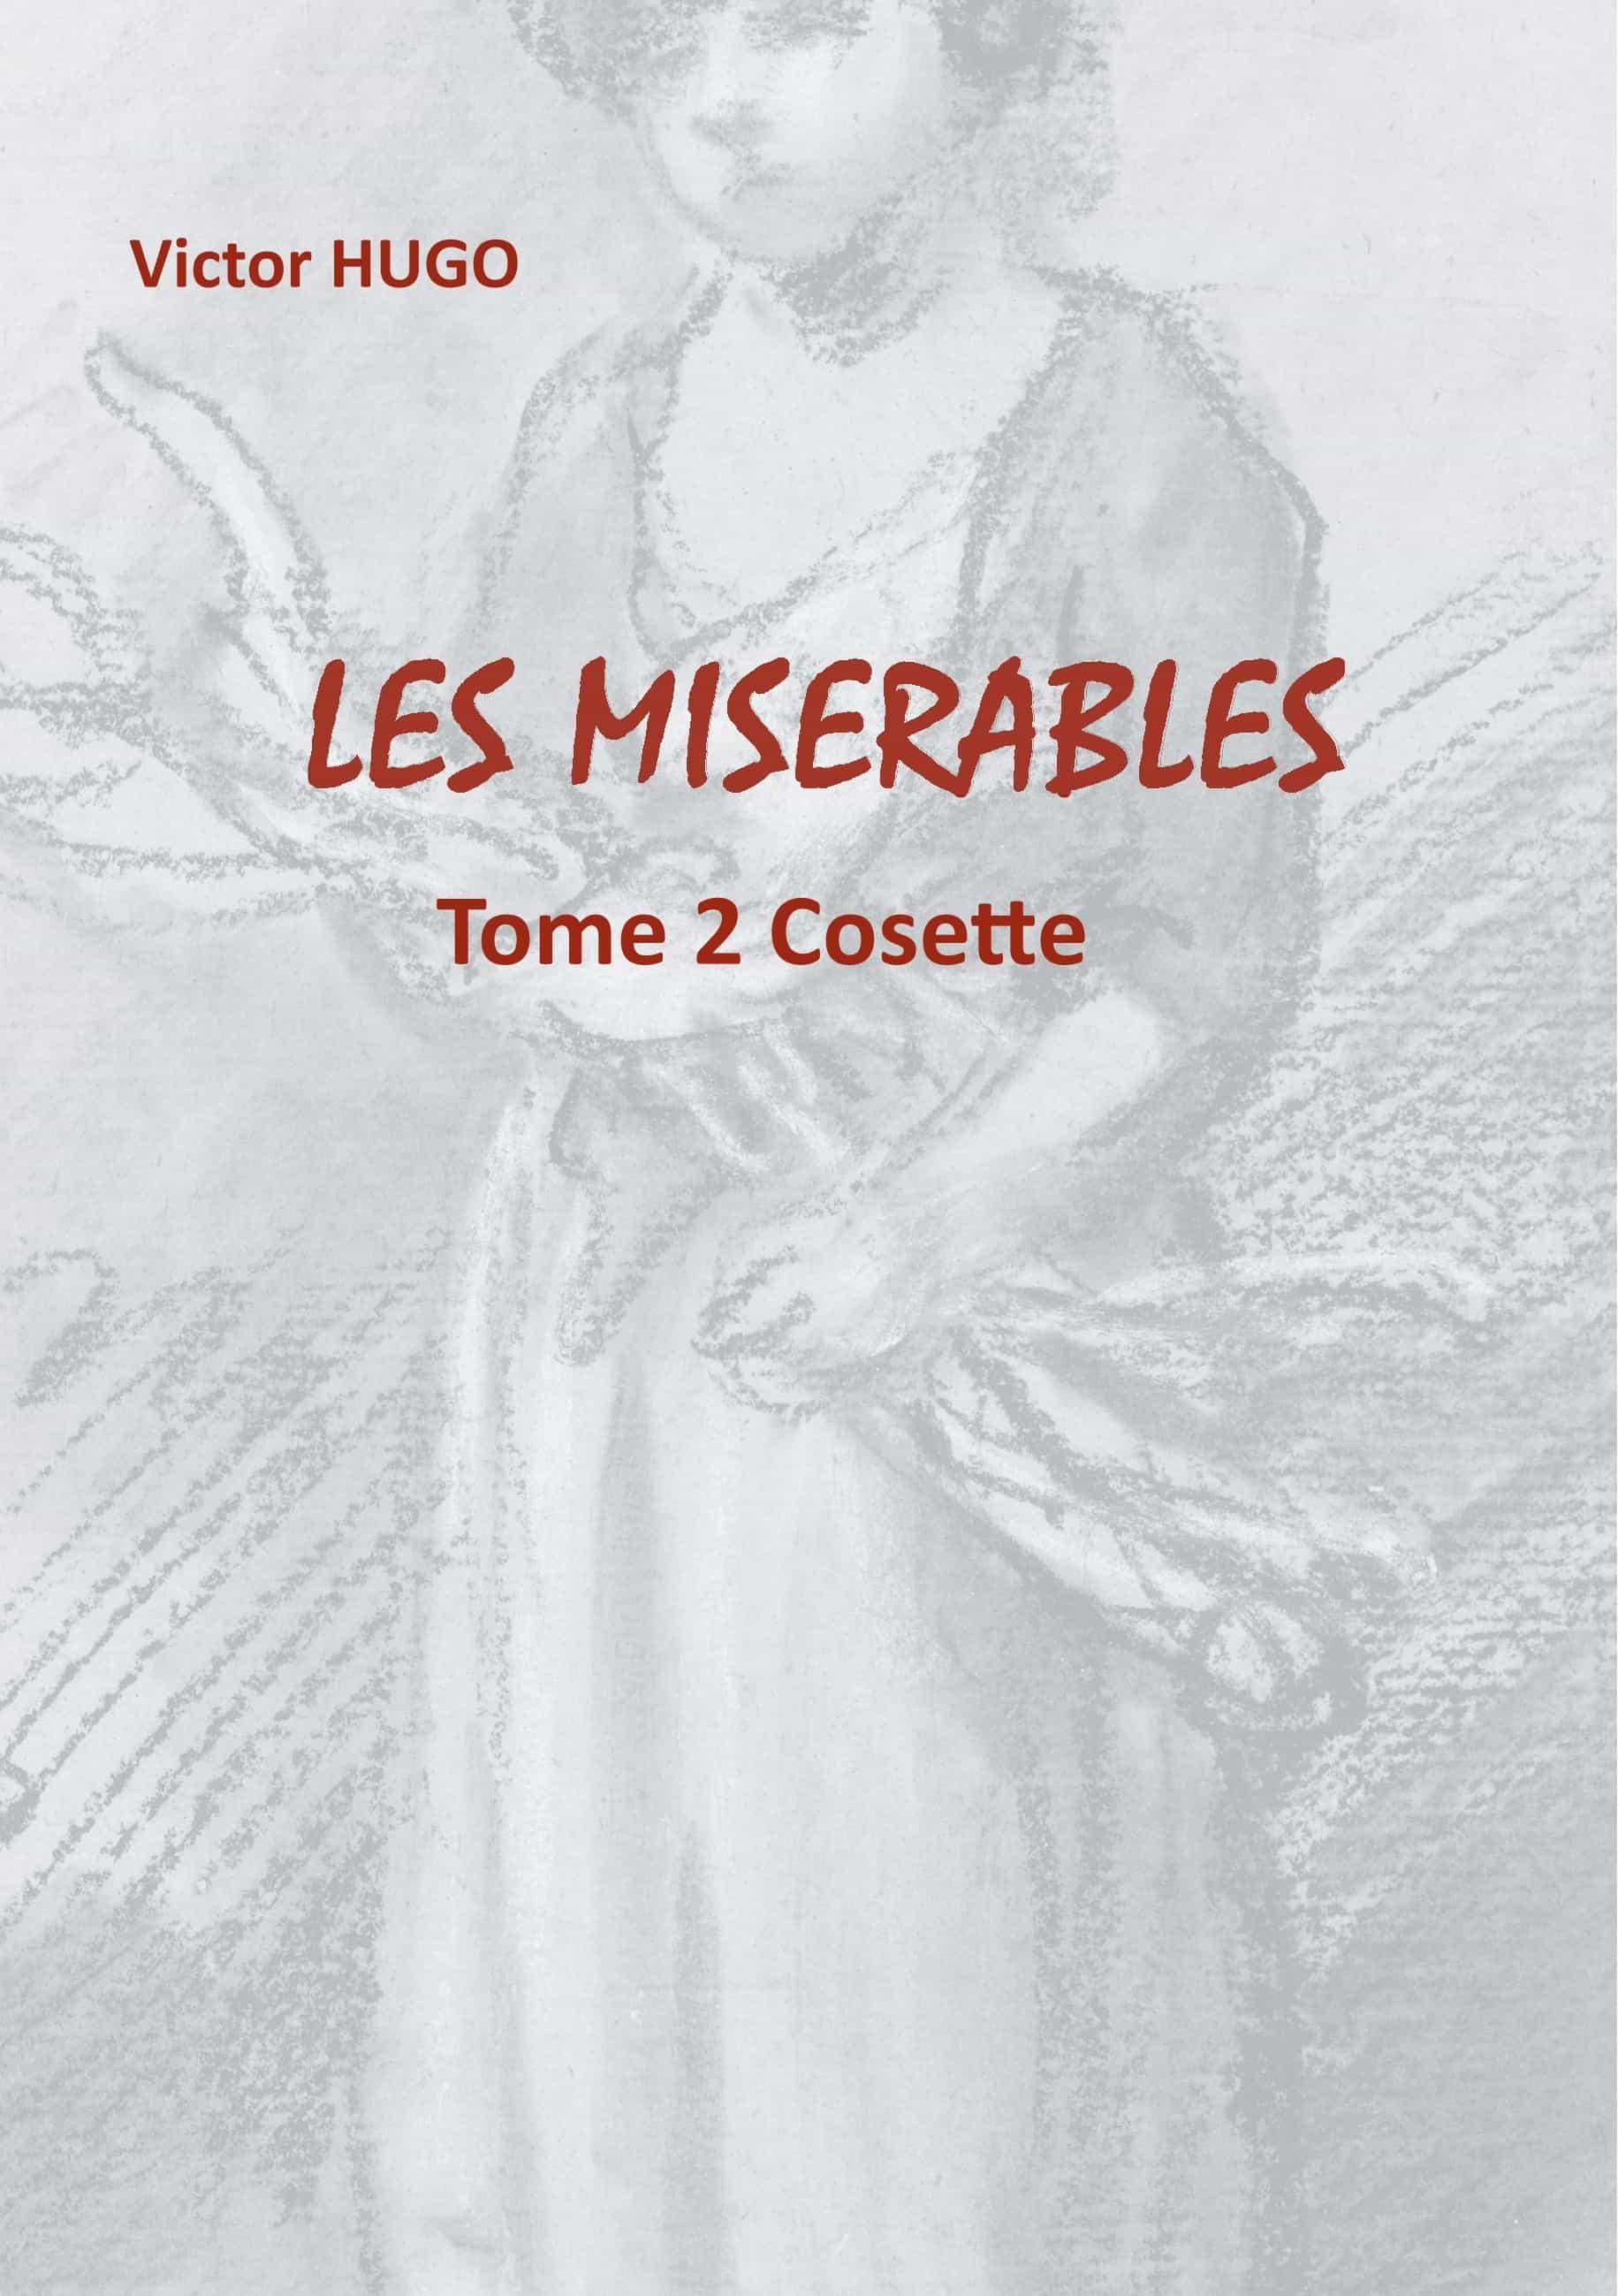 Les Misérables - Hugo Victor